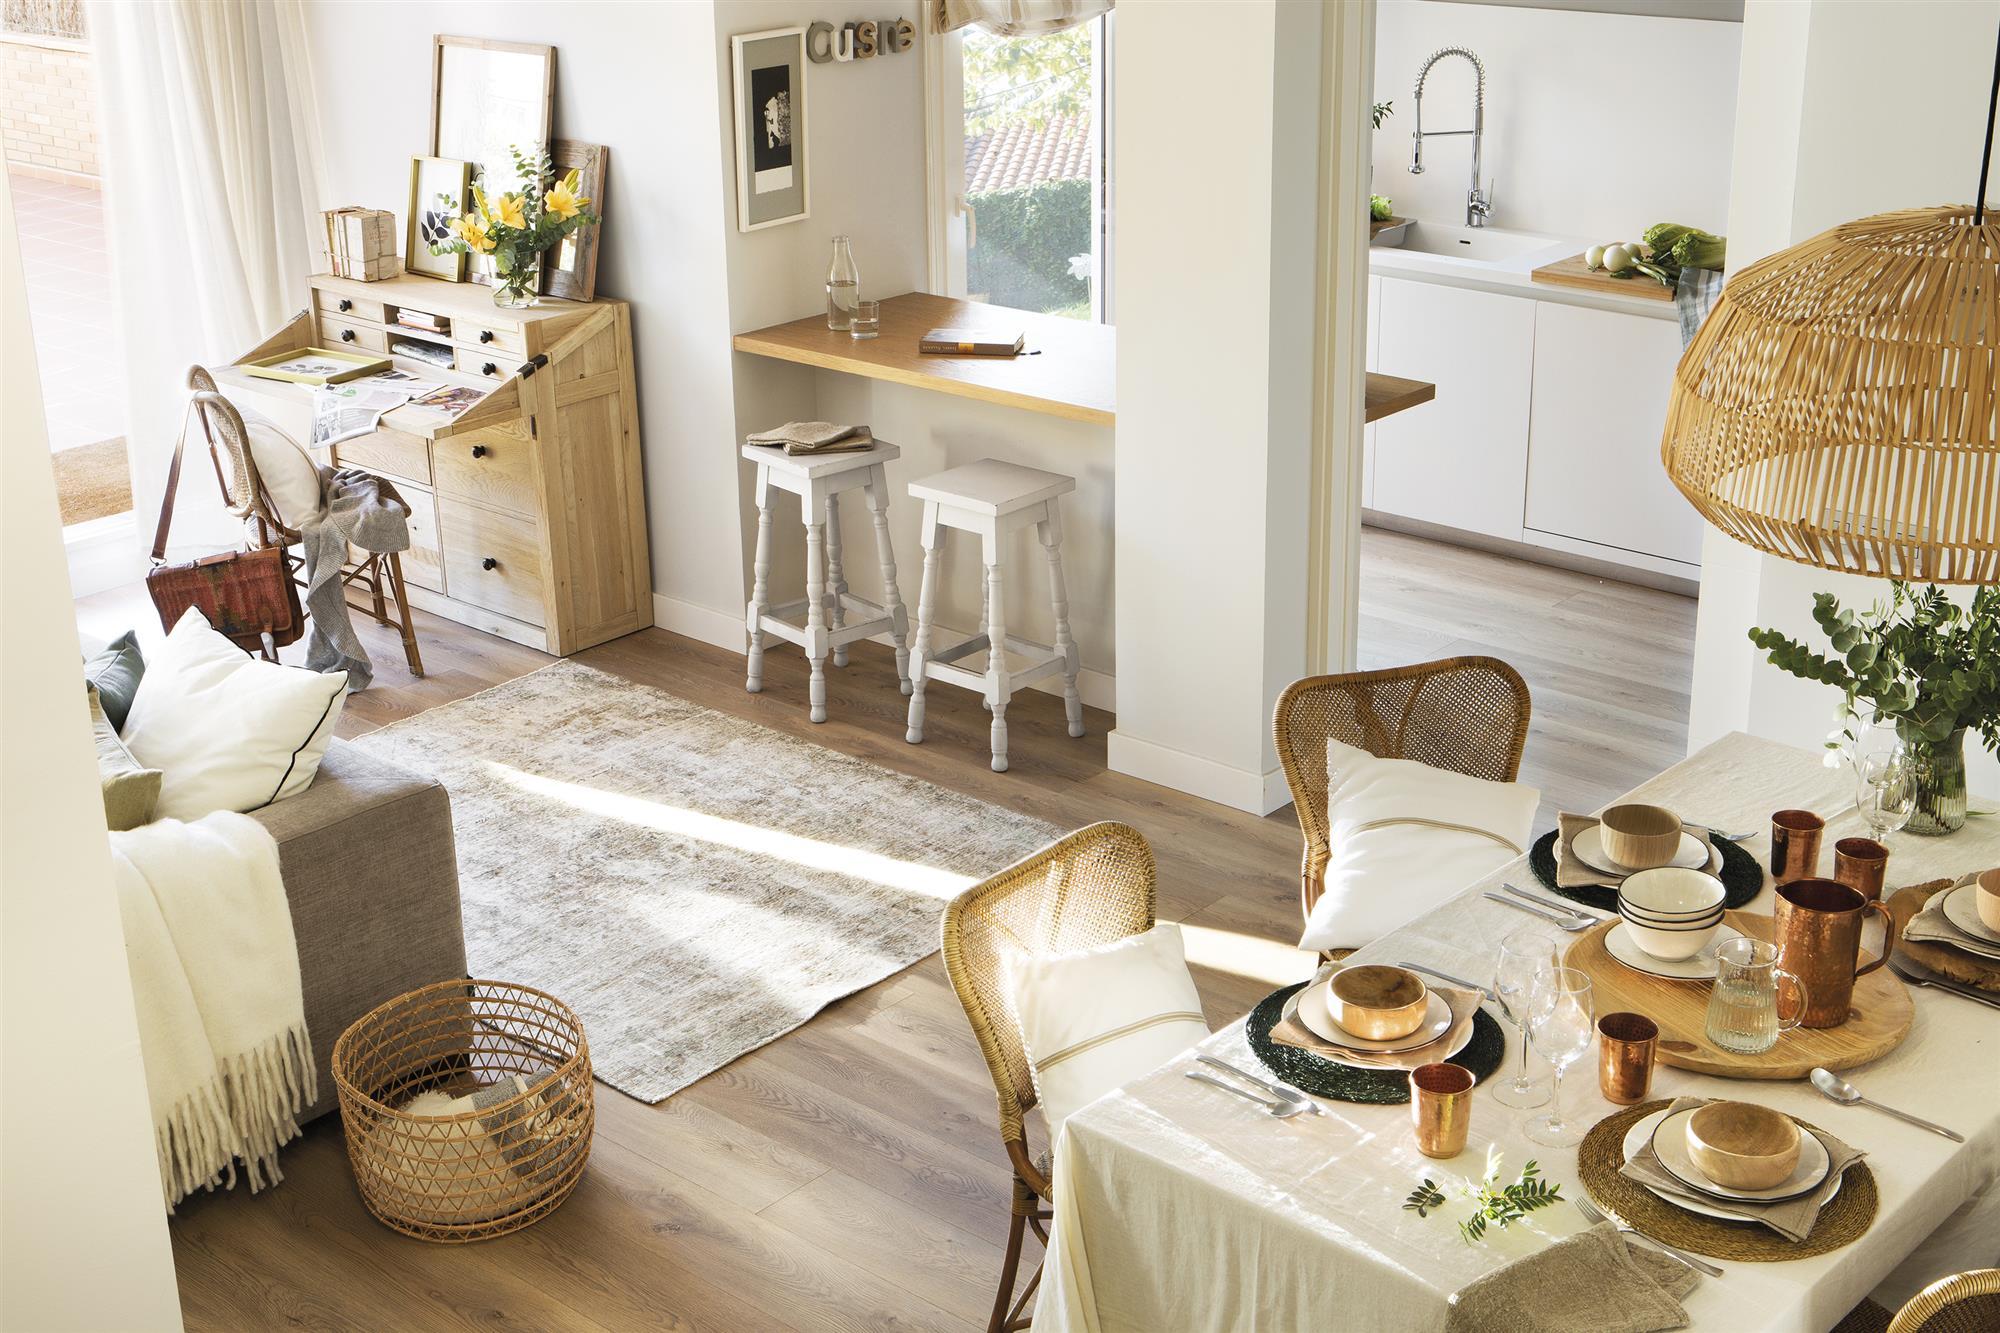 Cocinas muebles decoraci n dise o blancas o peque as - Alicatar cocina detras muebles ...